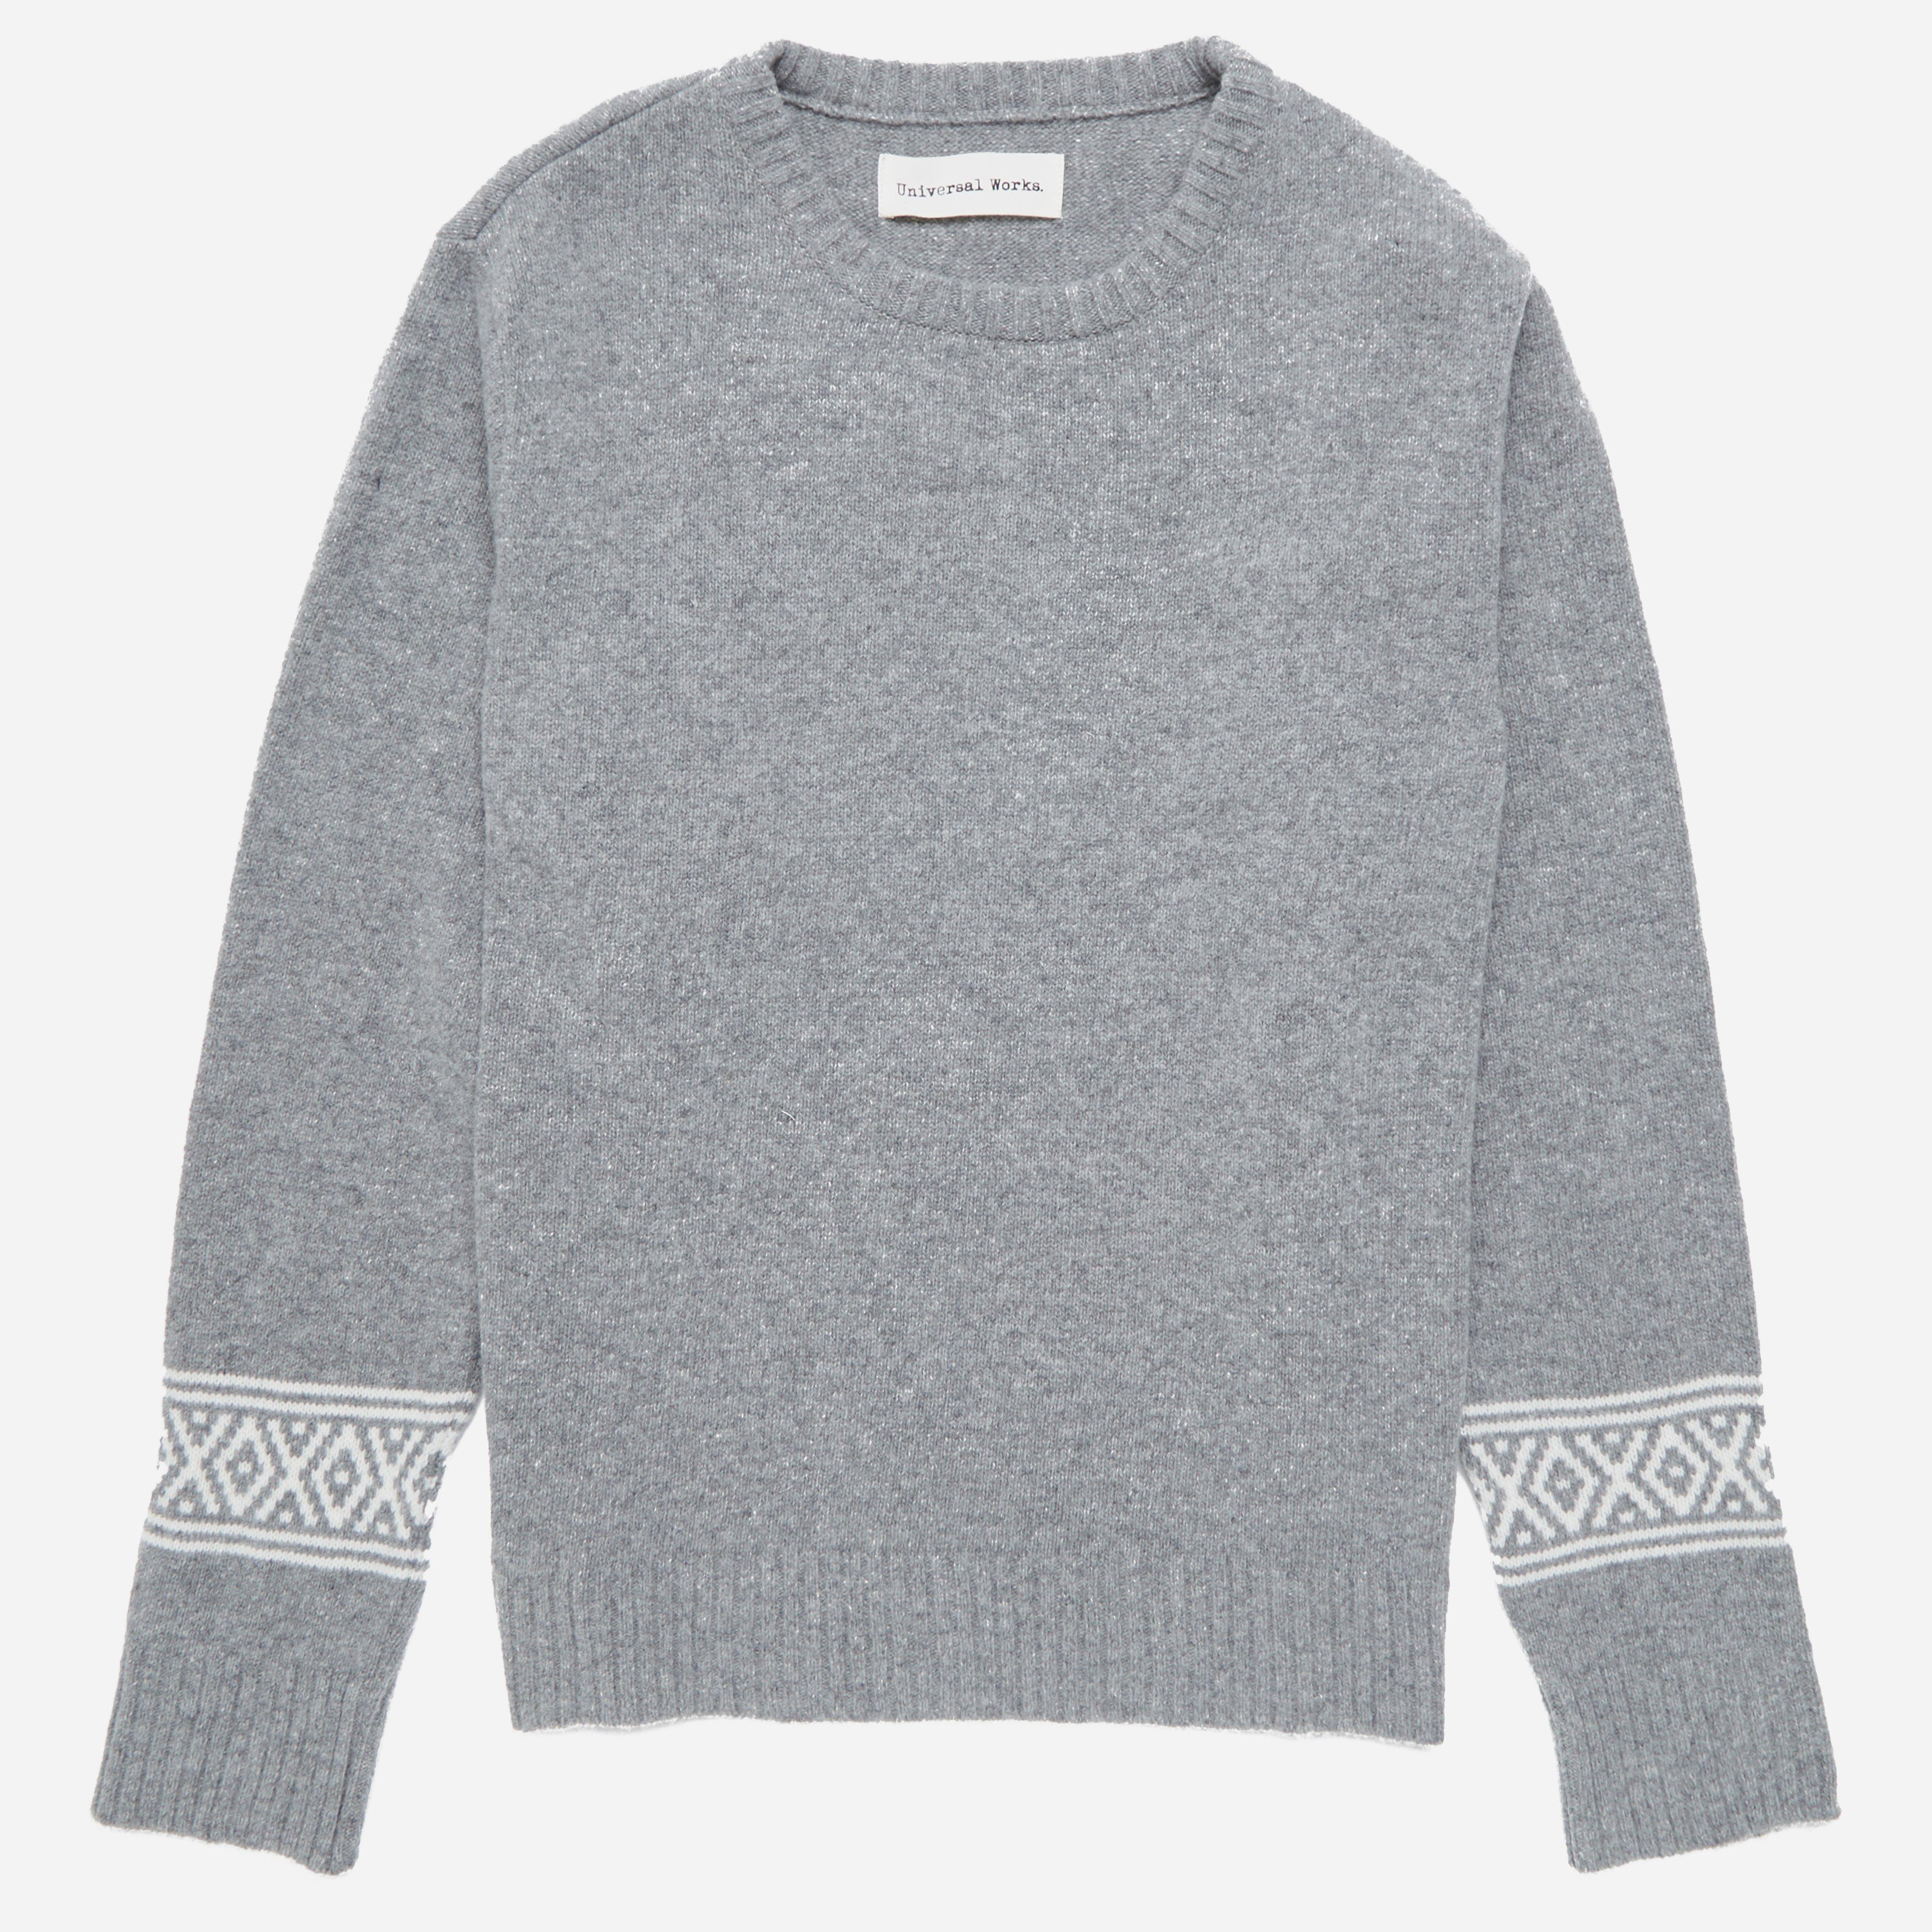 Universal Works Soft Wool Faroe Classic Crew